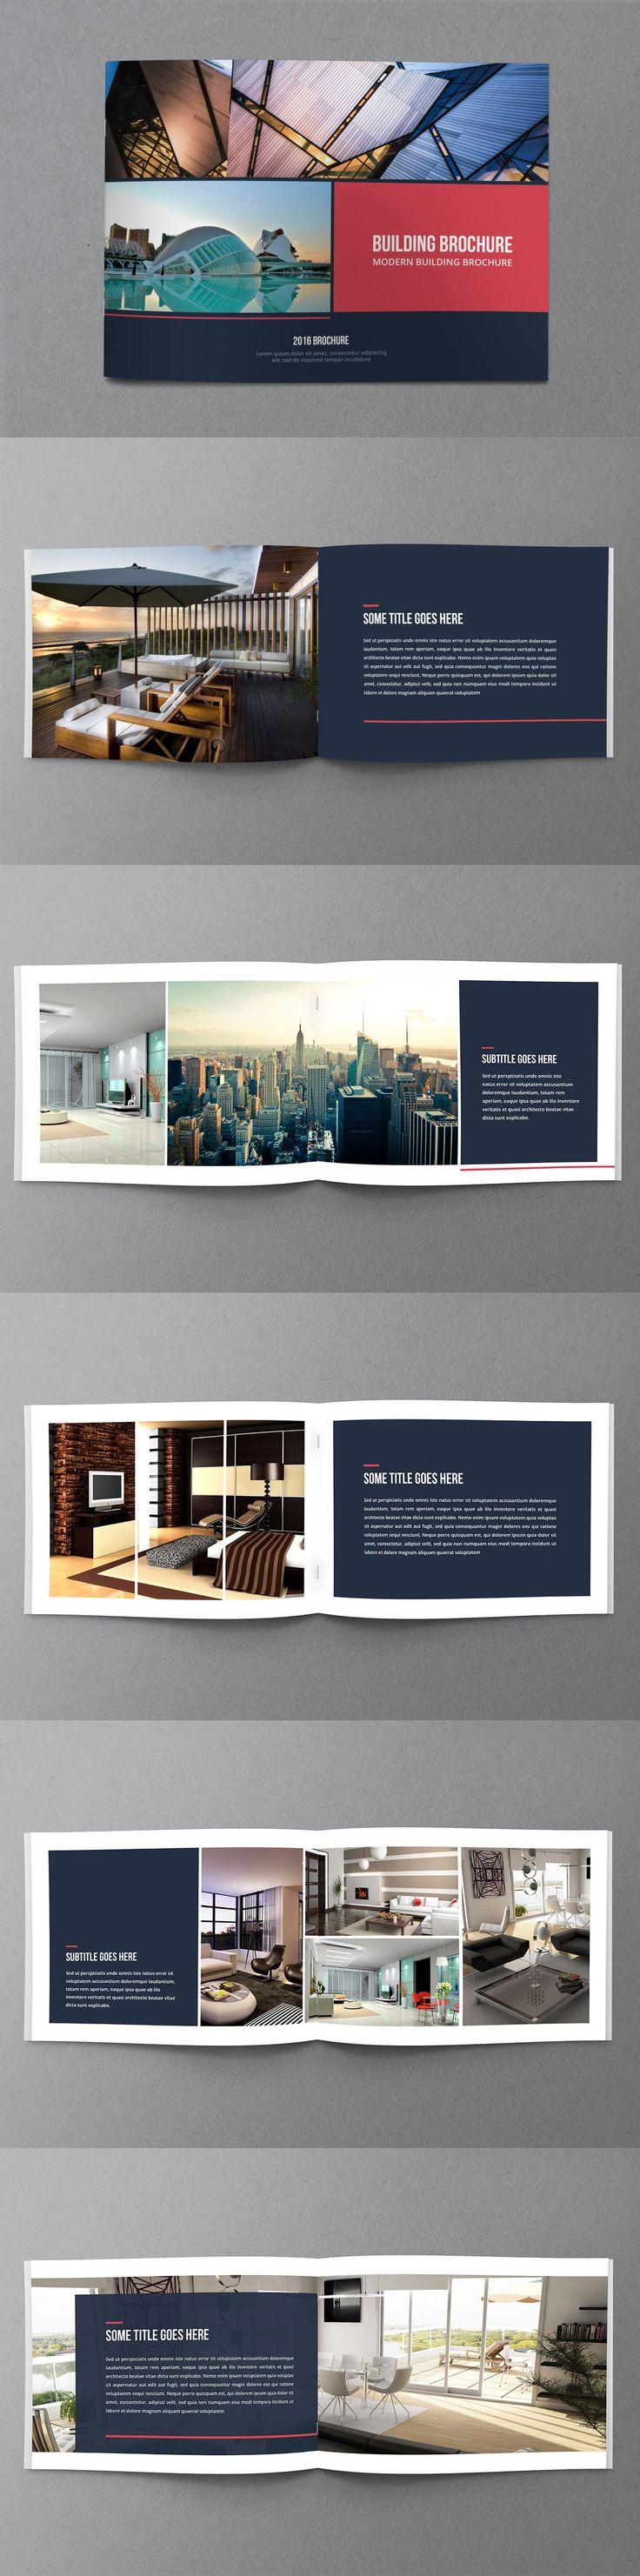 Multipurpose Corporate Brochure Template InDesign INDD